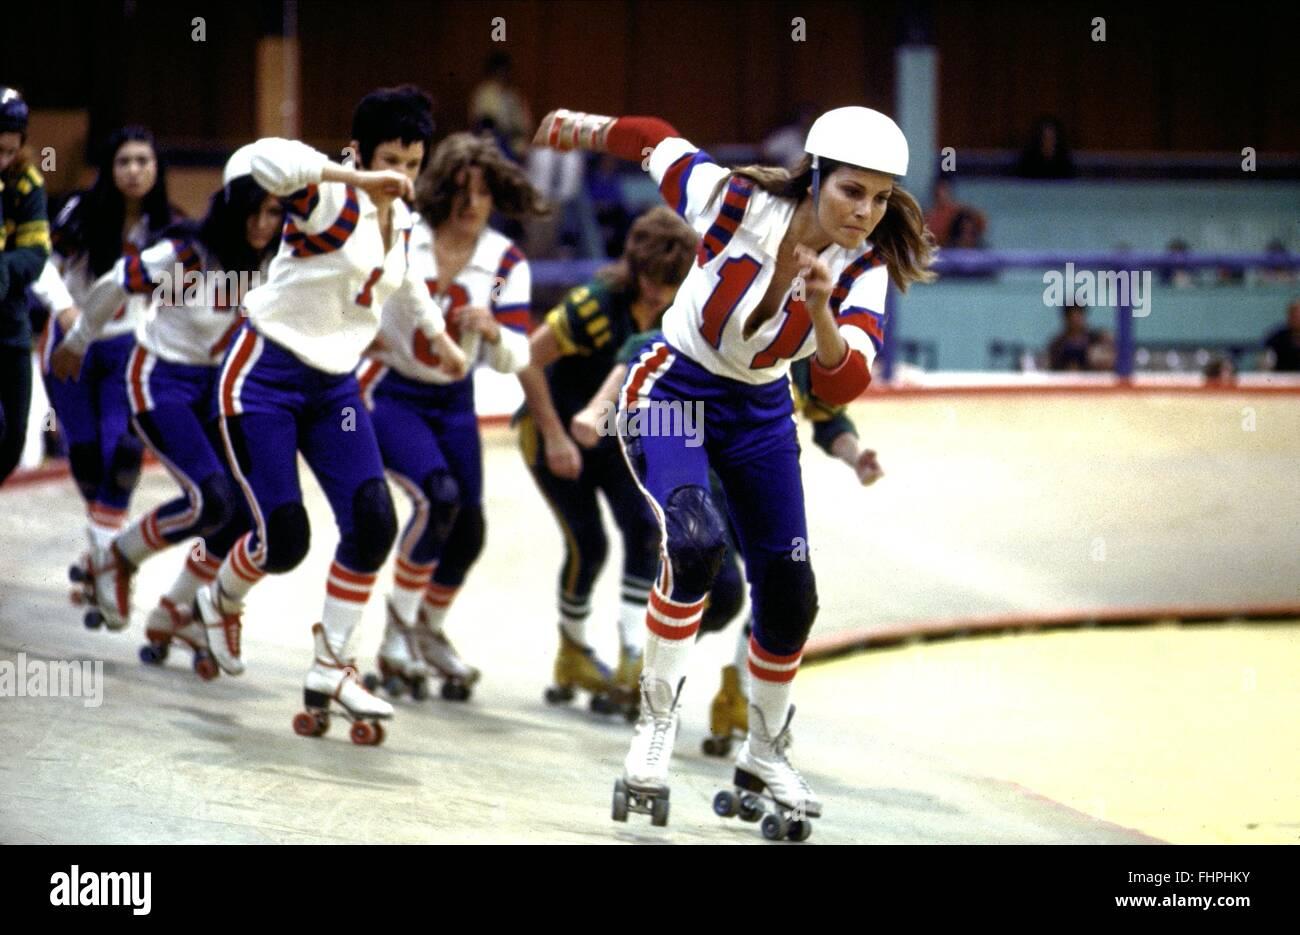 Roller skates kansas city - Raquel Welch Kansas City Bomber 1972